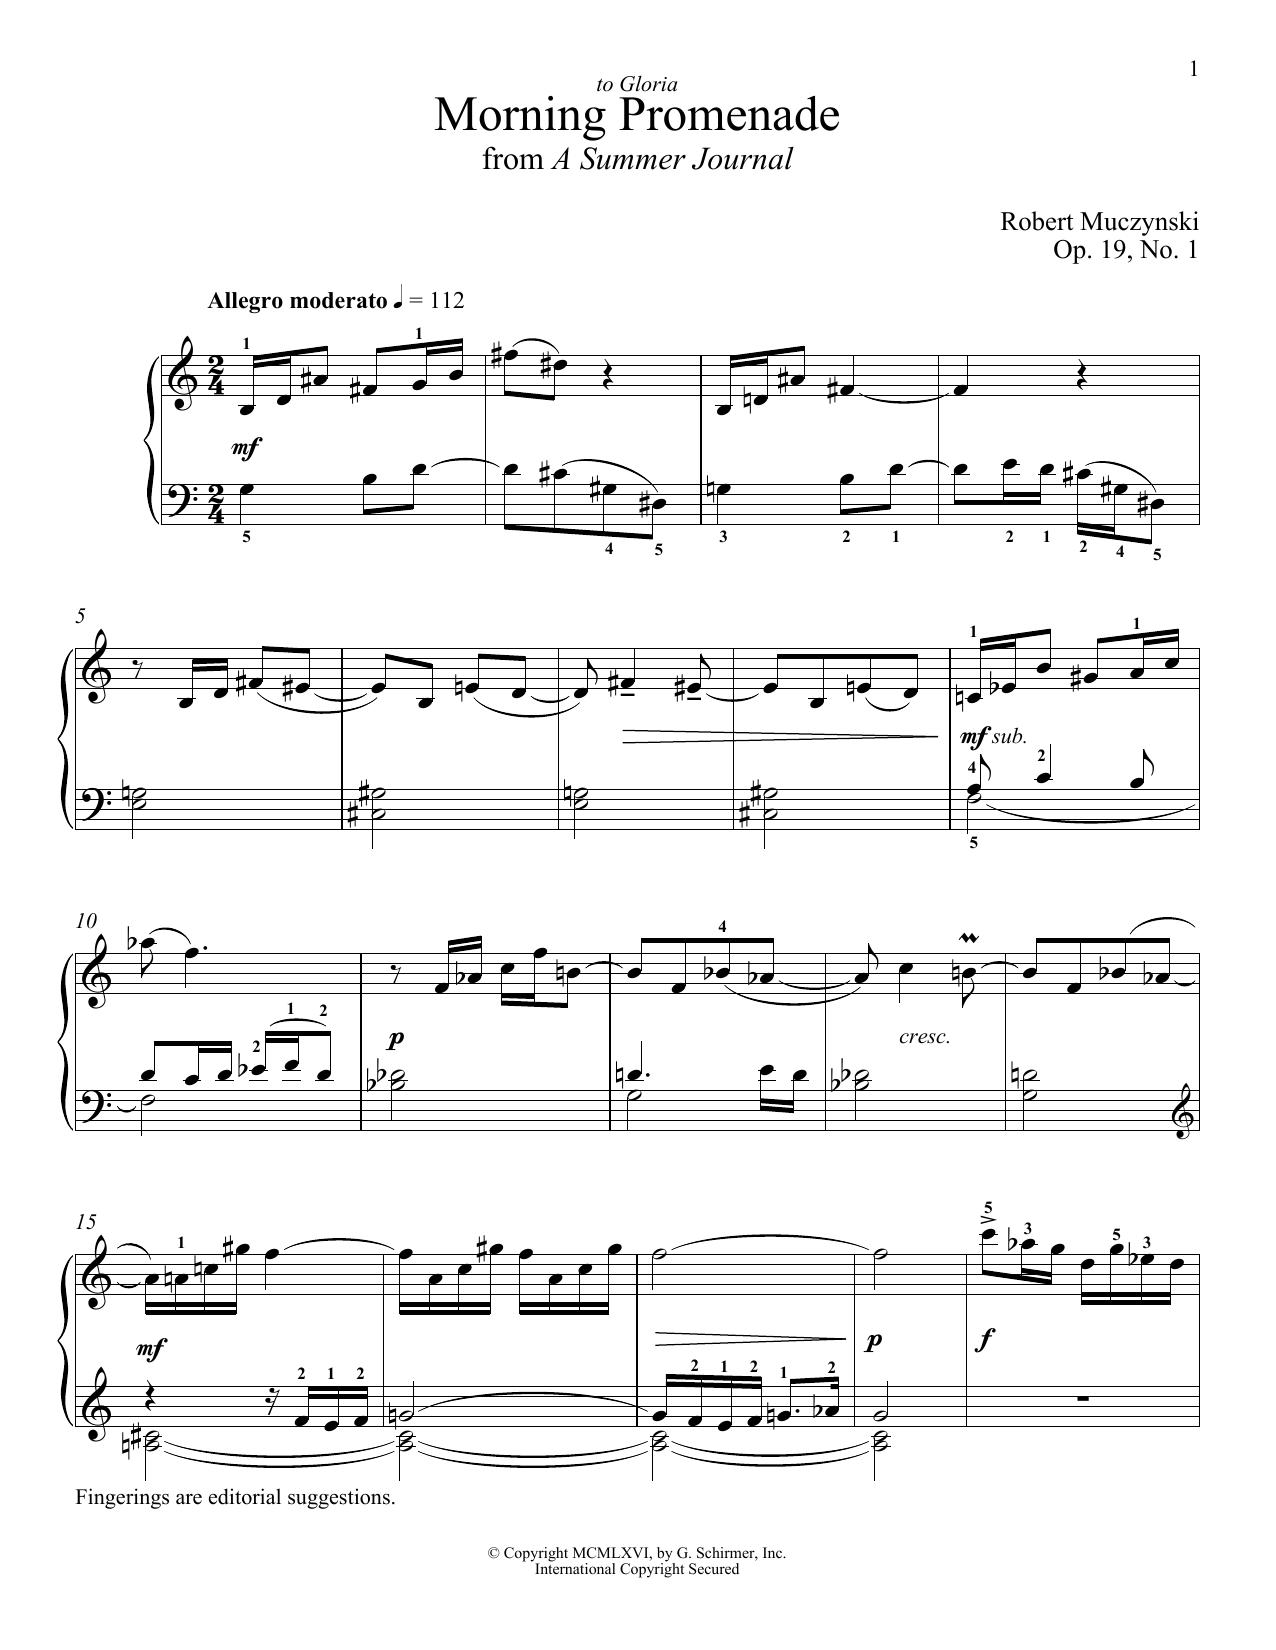 Download Robert Muczynski 'Morning Promenade' Digital Sheet Music Notes & Chords and start playing in minutes